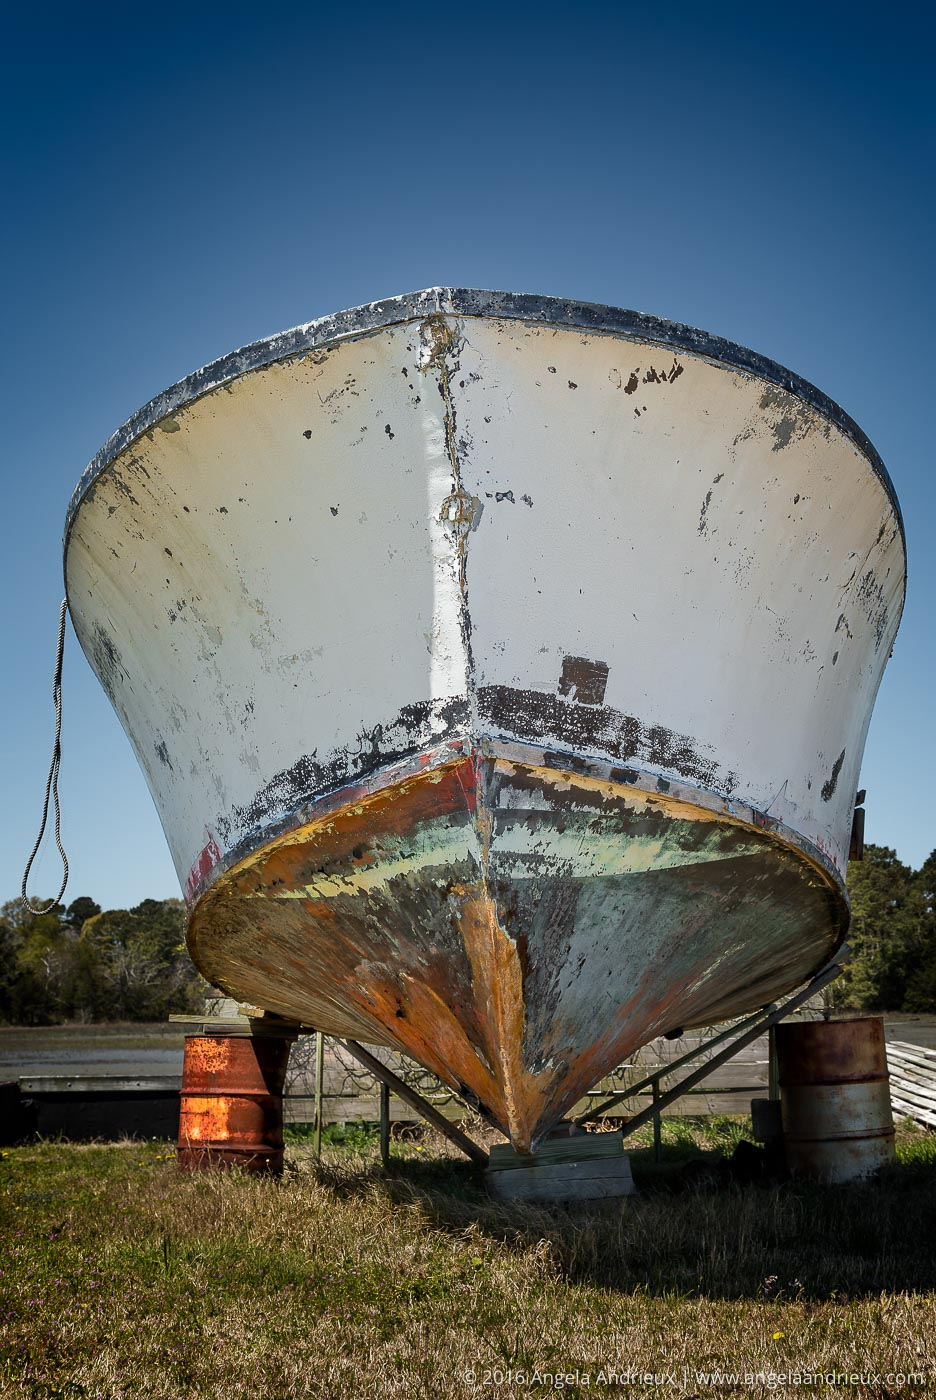 Abandoned Fishing Boat | Eastern Shore | Willis Wharf, VA